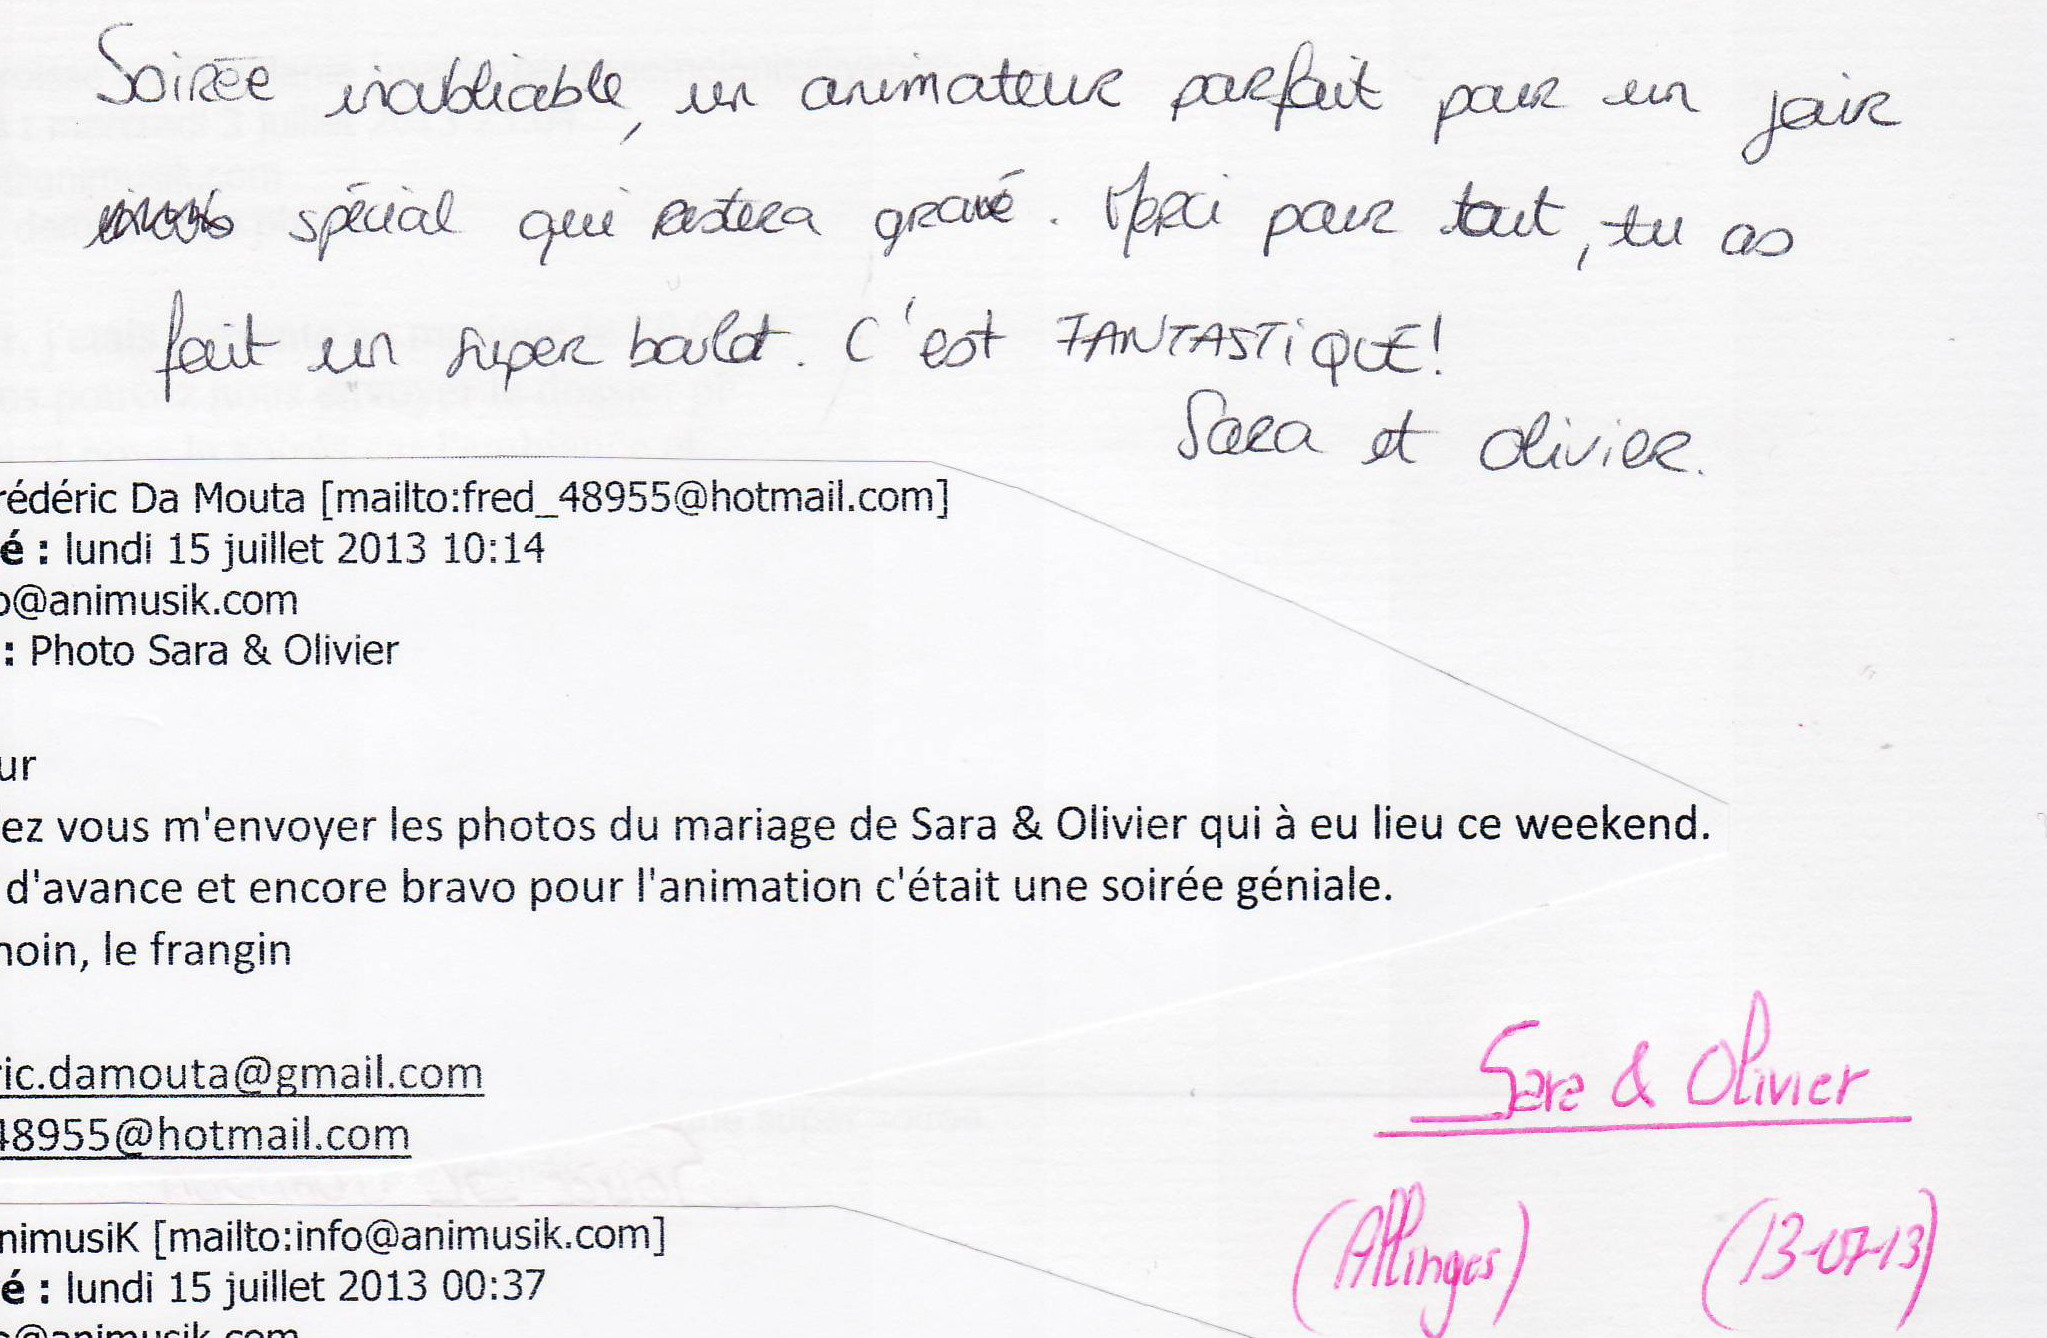 Mariage DA MOUTA Olivier & Sara (Allinges) (13-07-2013)